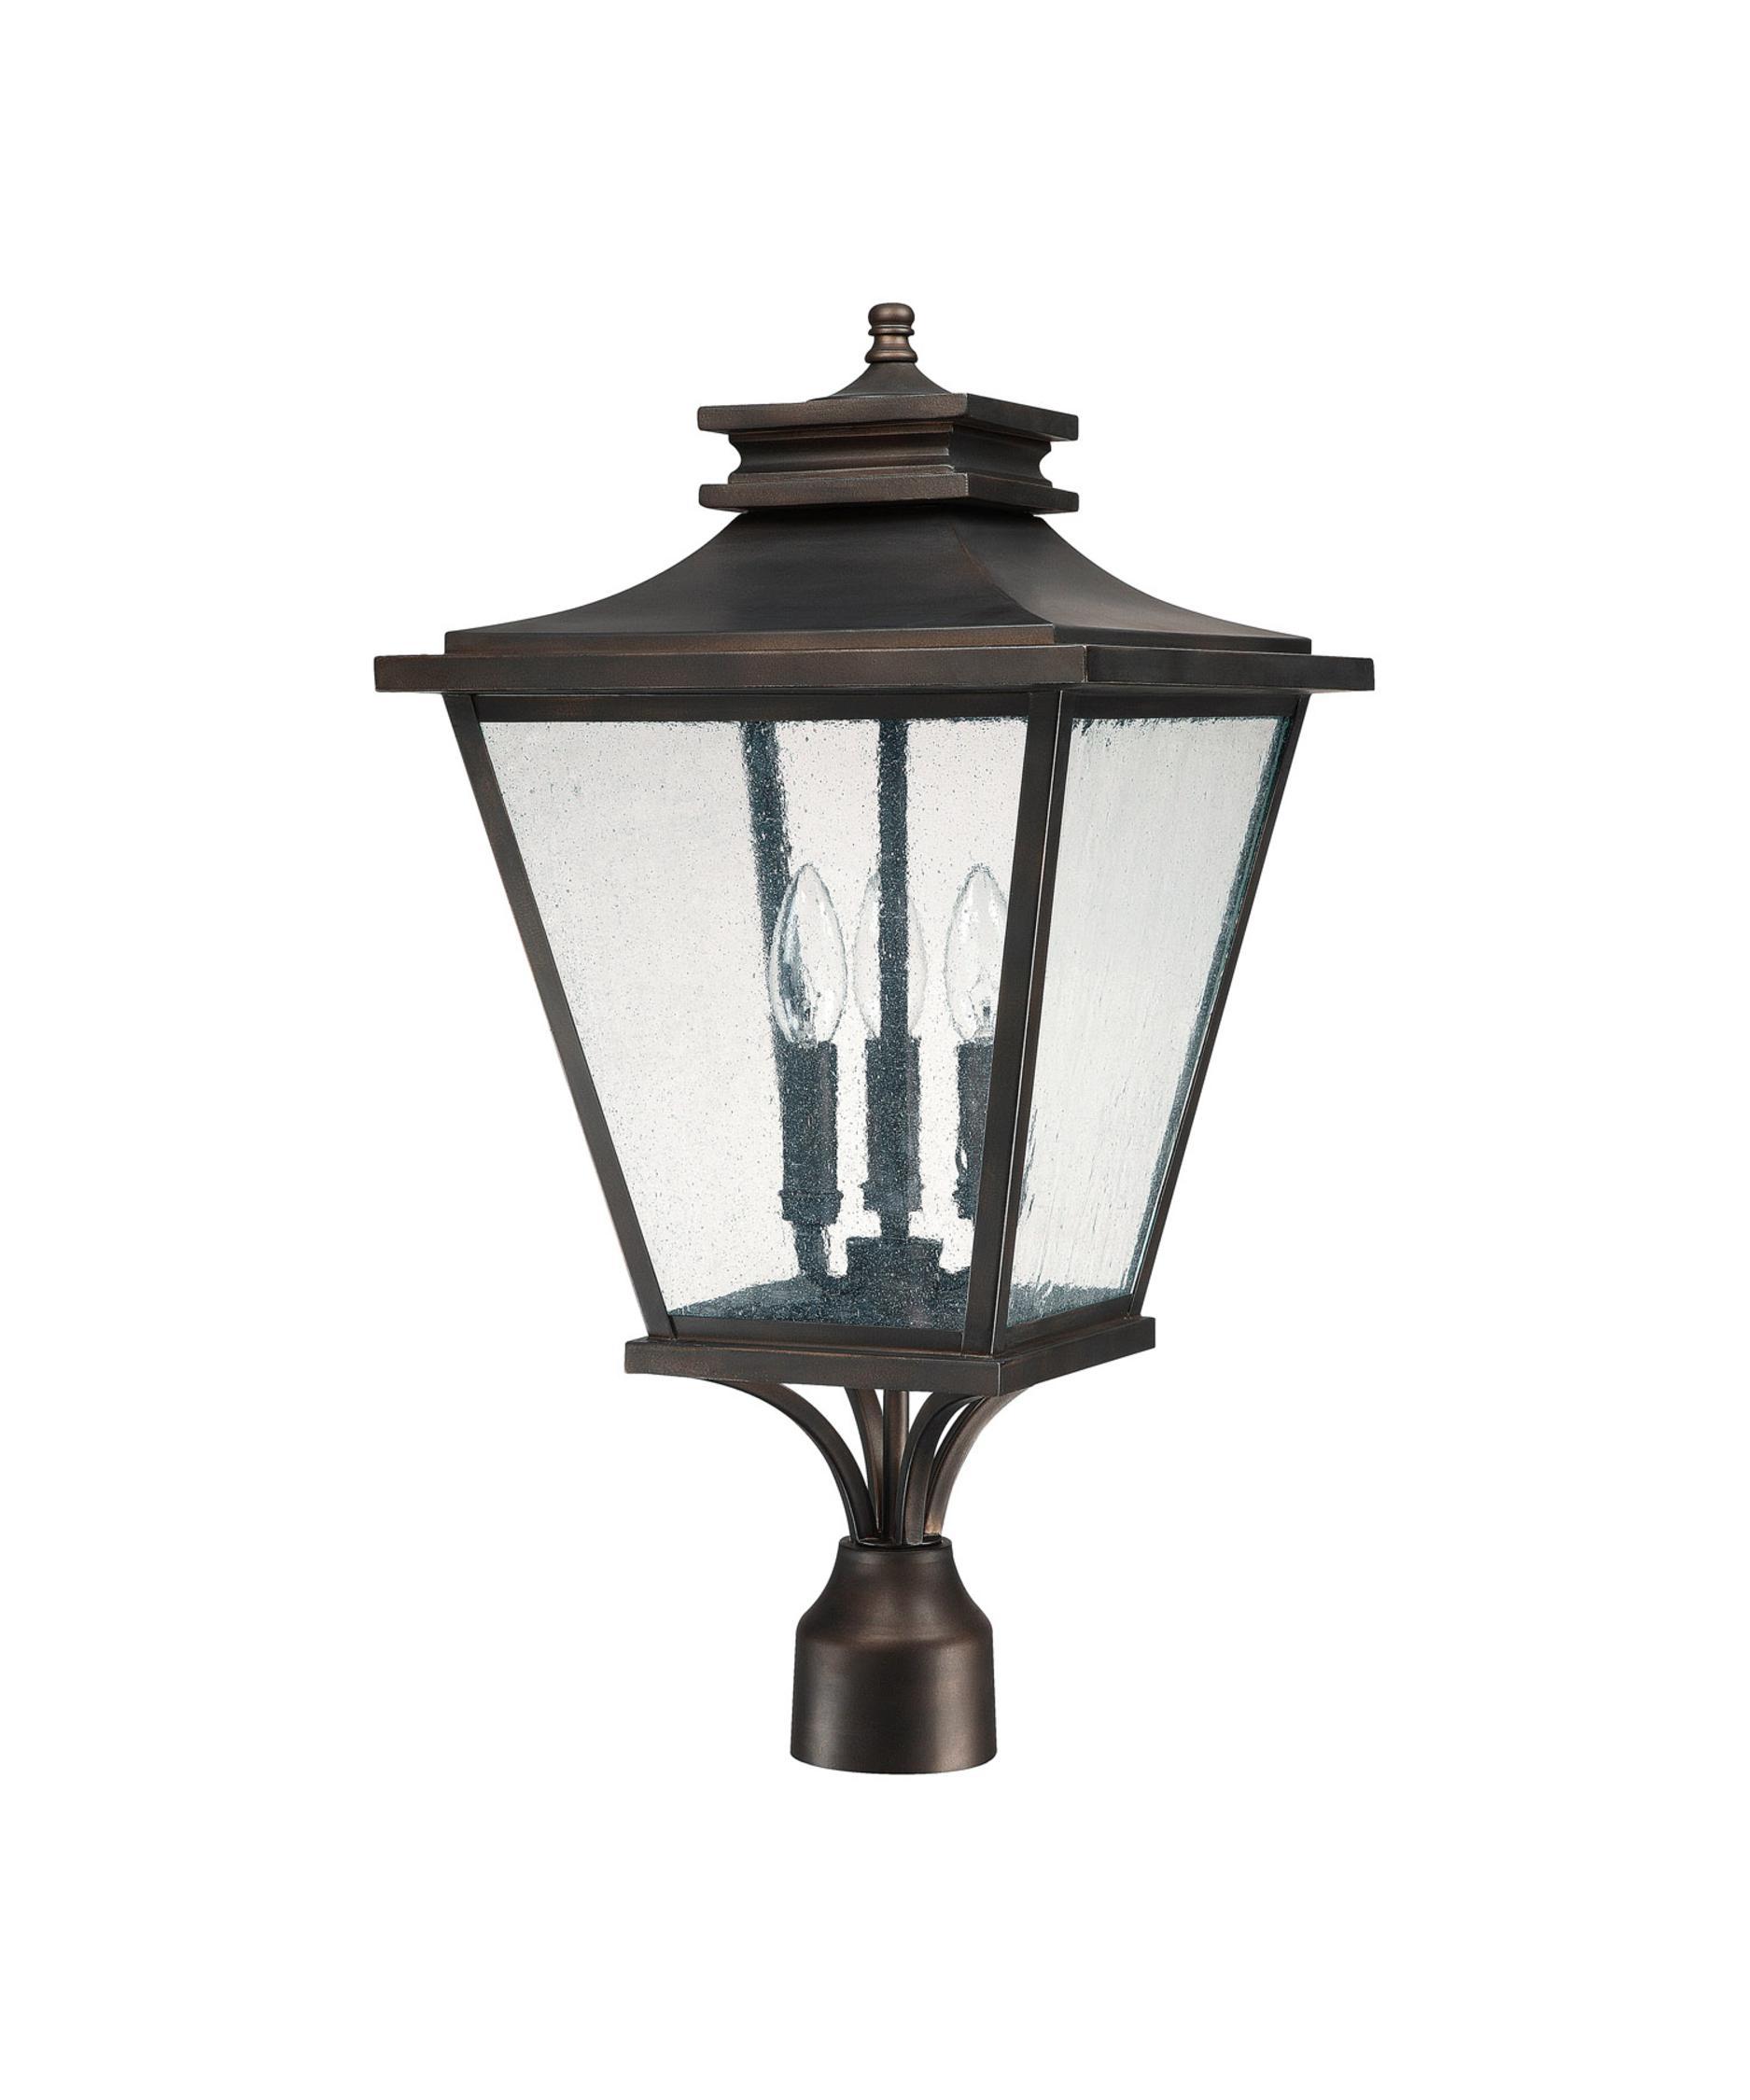 capital lighting gentry 12 inch wide 3 light outdoor post lamp capitol lighting - Capital Lighting